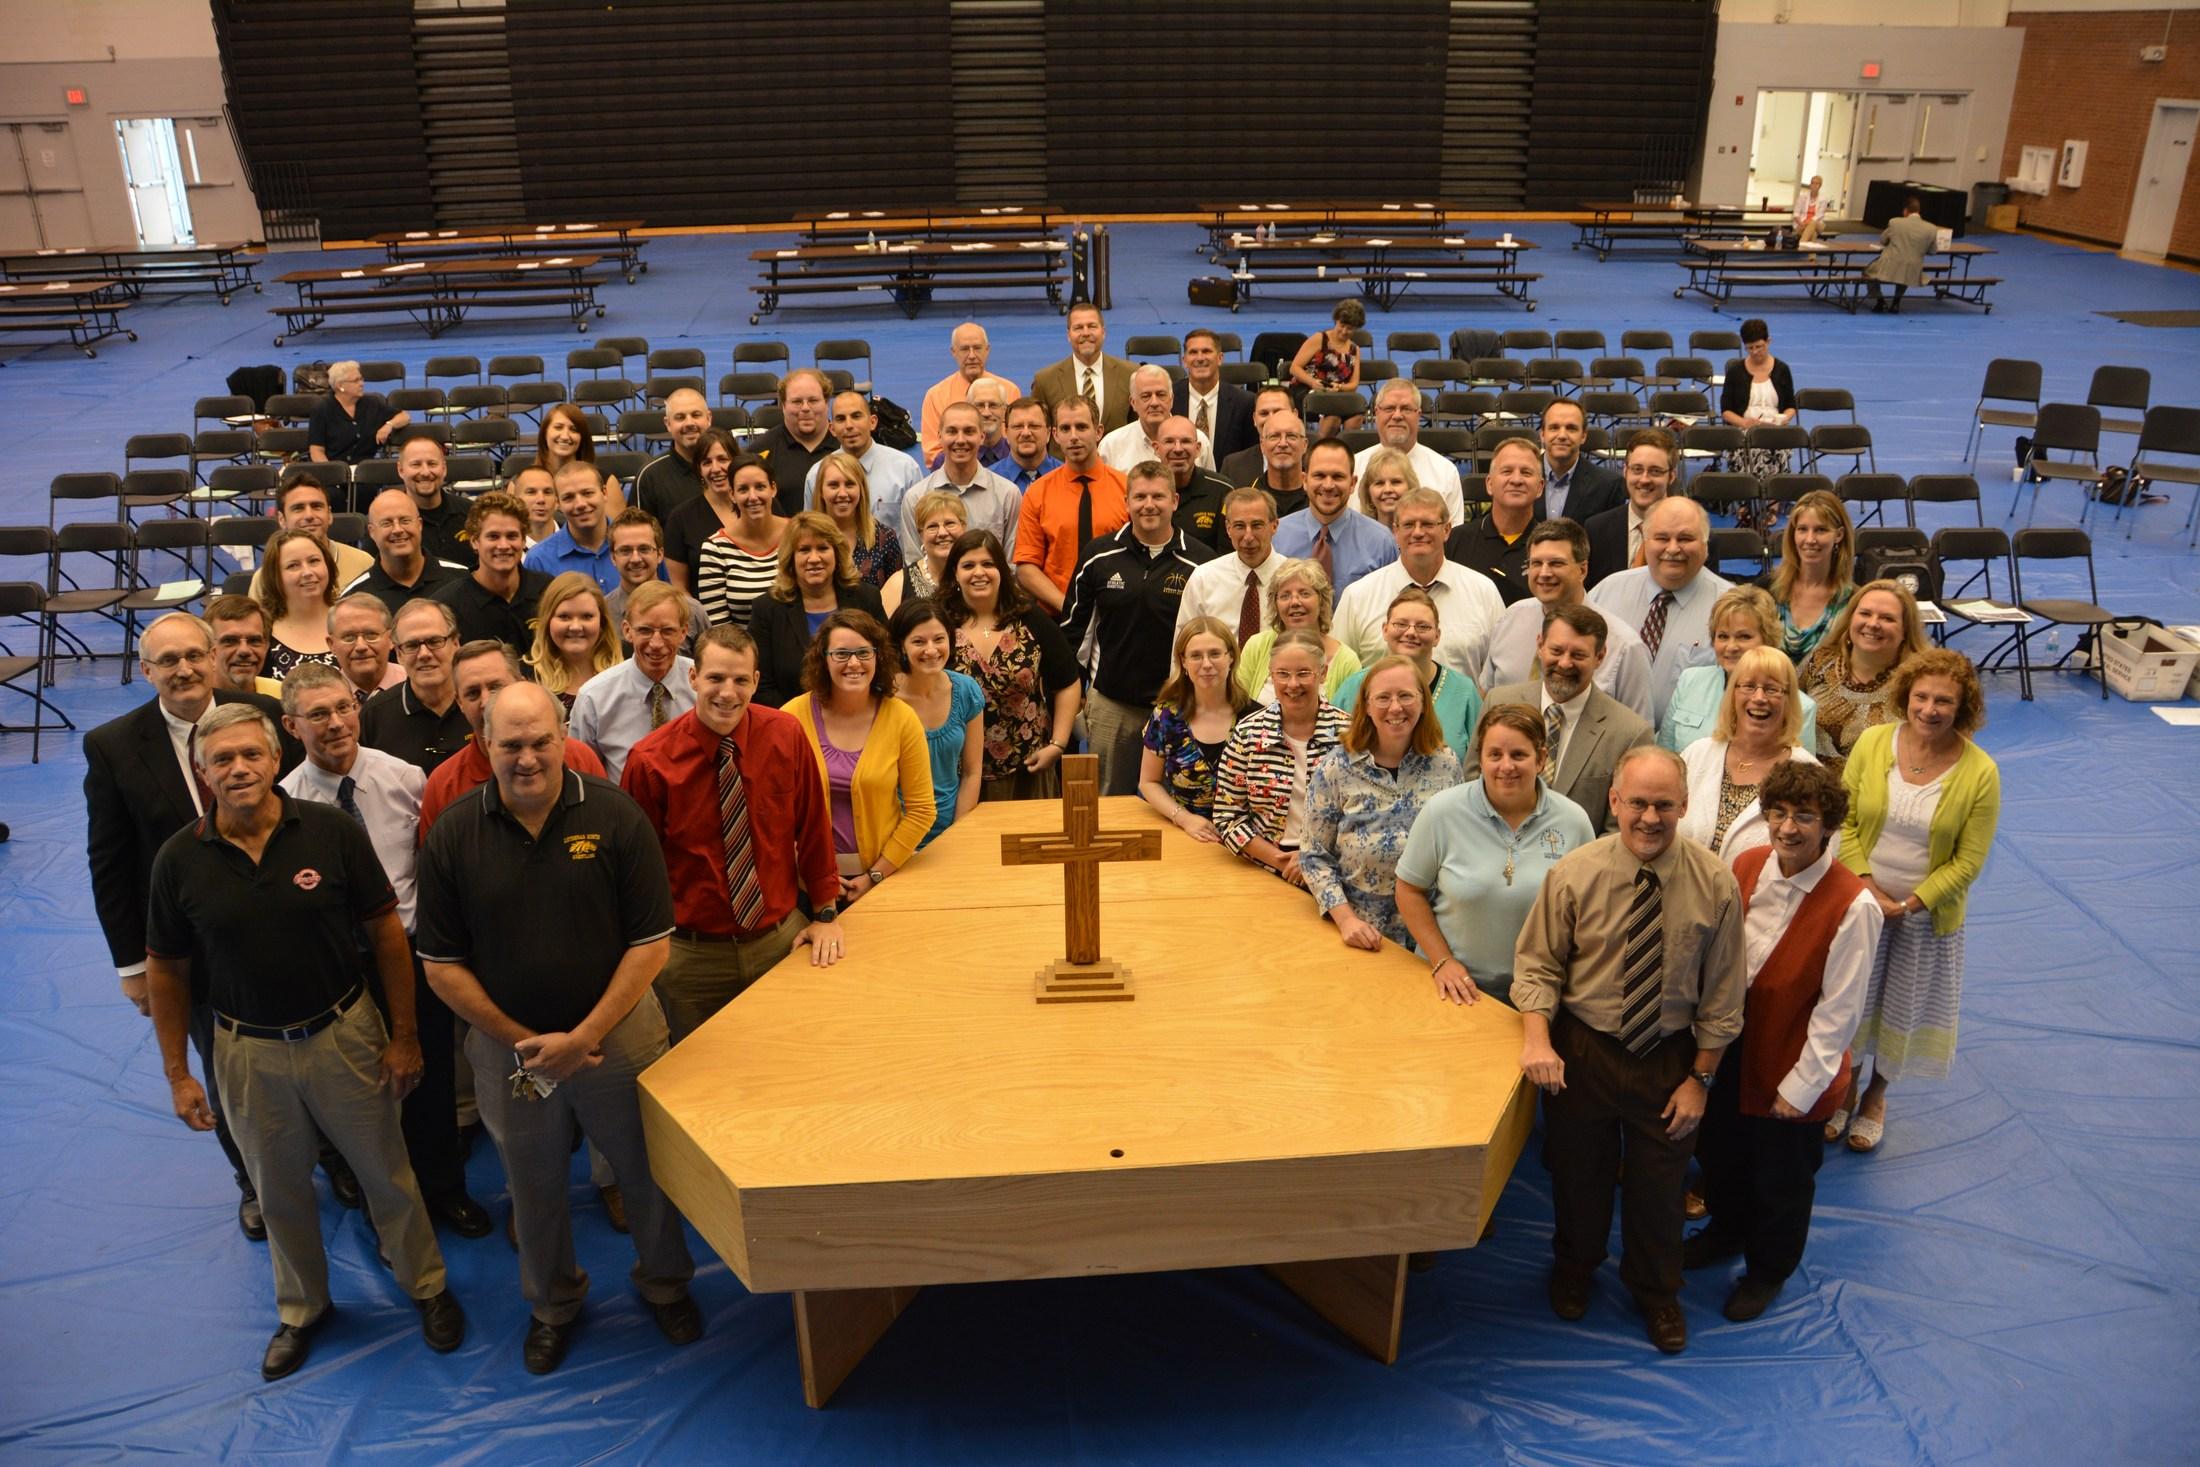 congregations.JPG